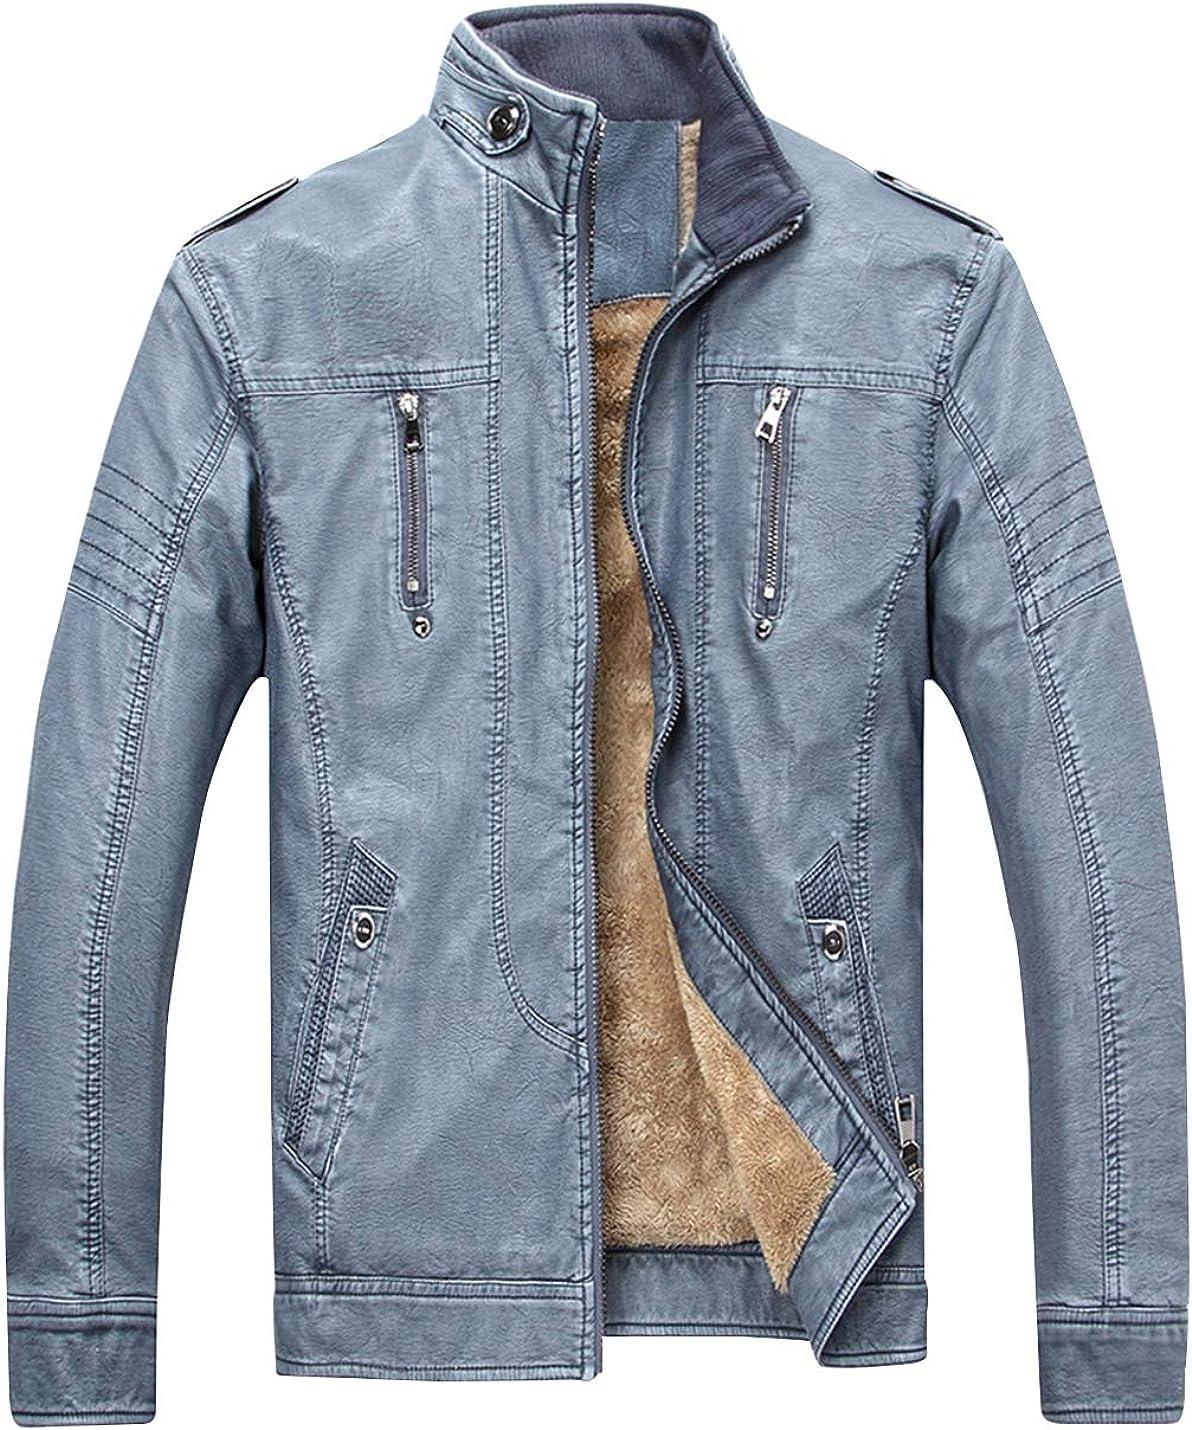 Gihuo Men's Warm Fleece Lined PU Leather Motorcycle Jacket Outerwear